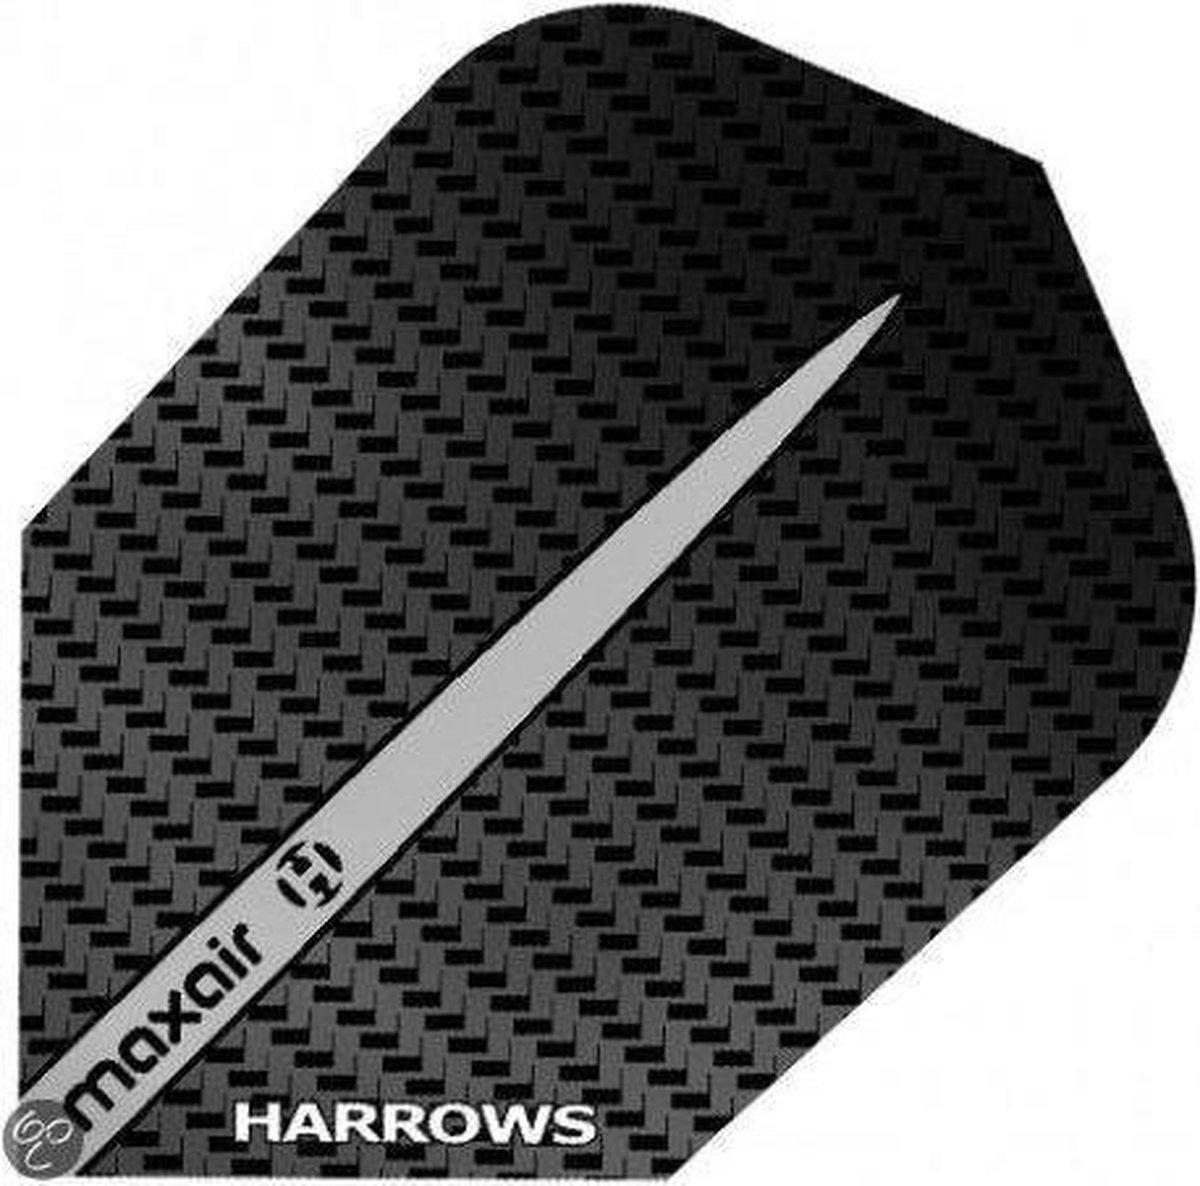 Harrows darts Flight 1801 marathon max air carbon